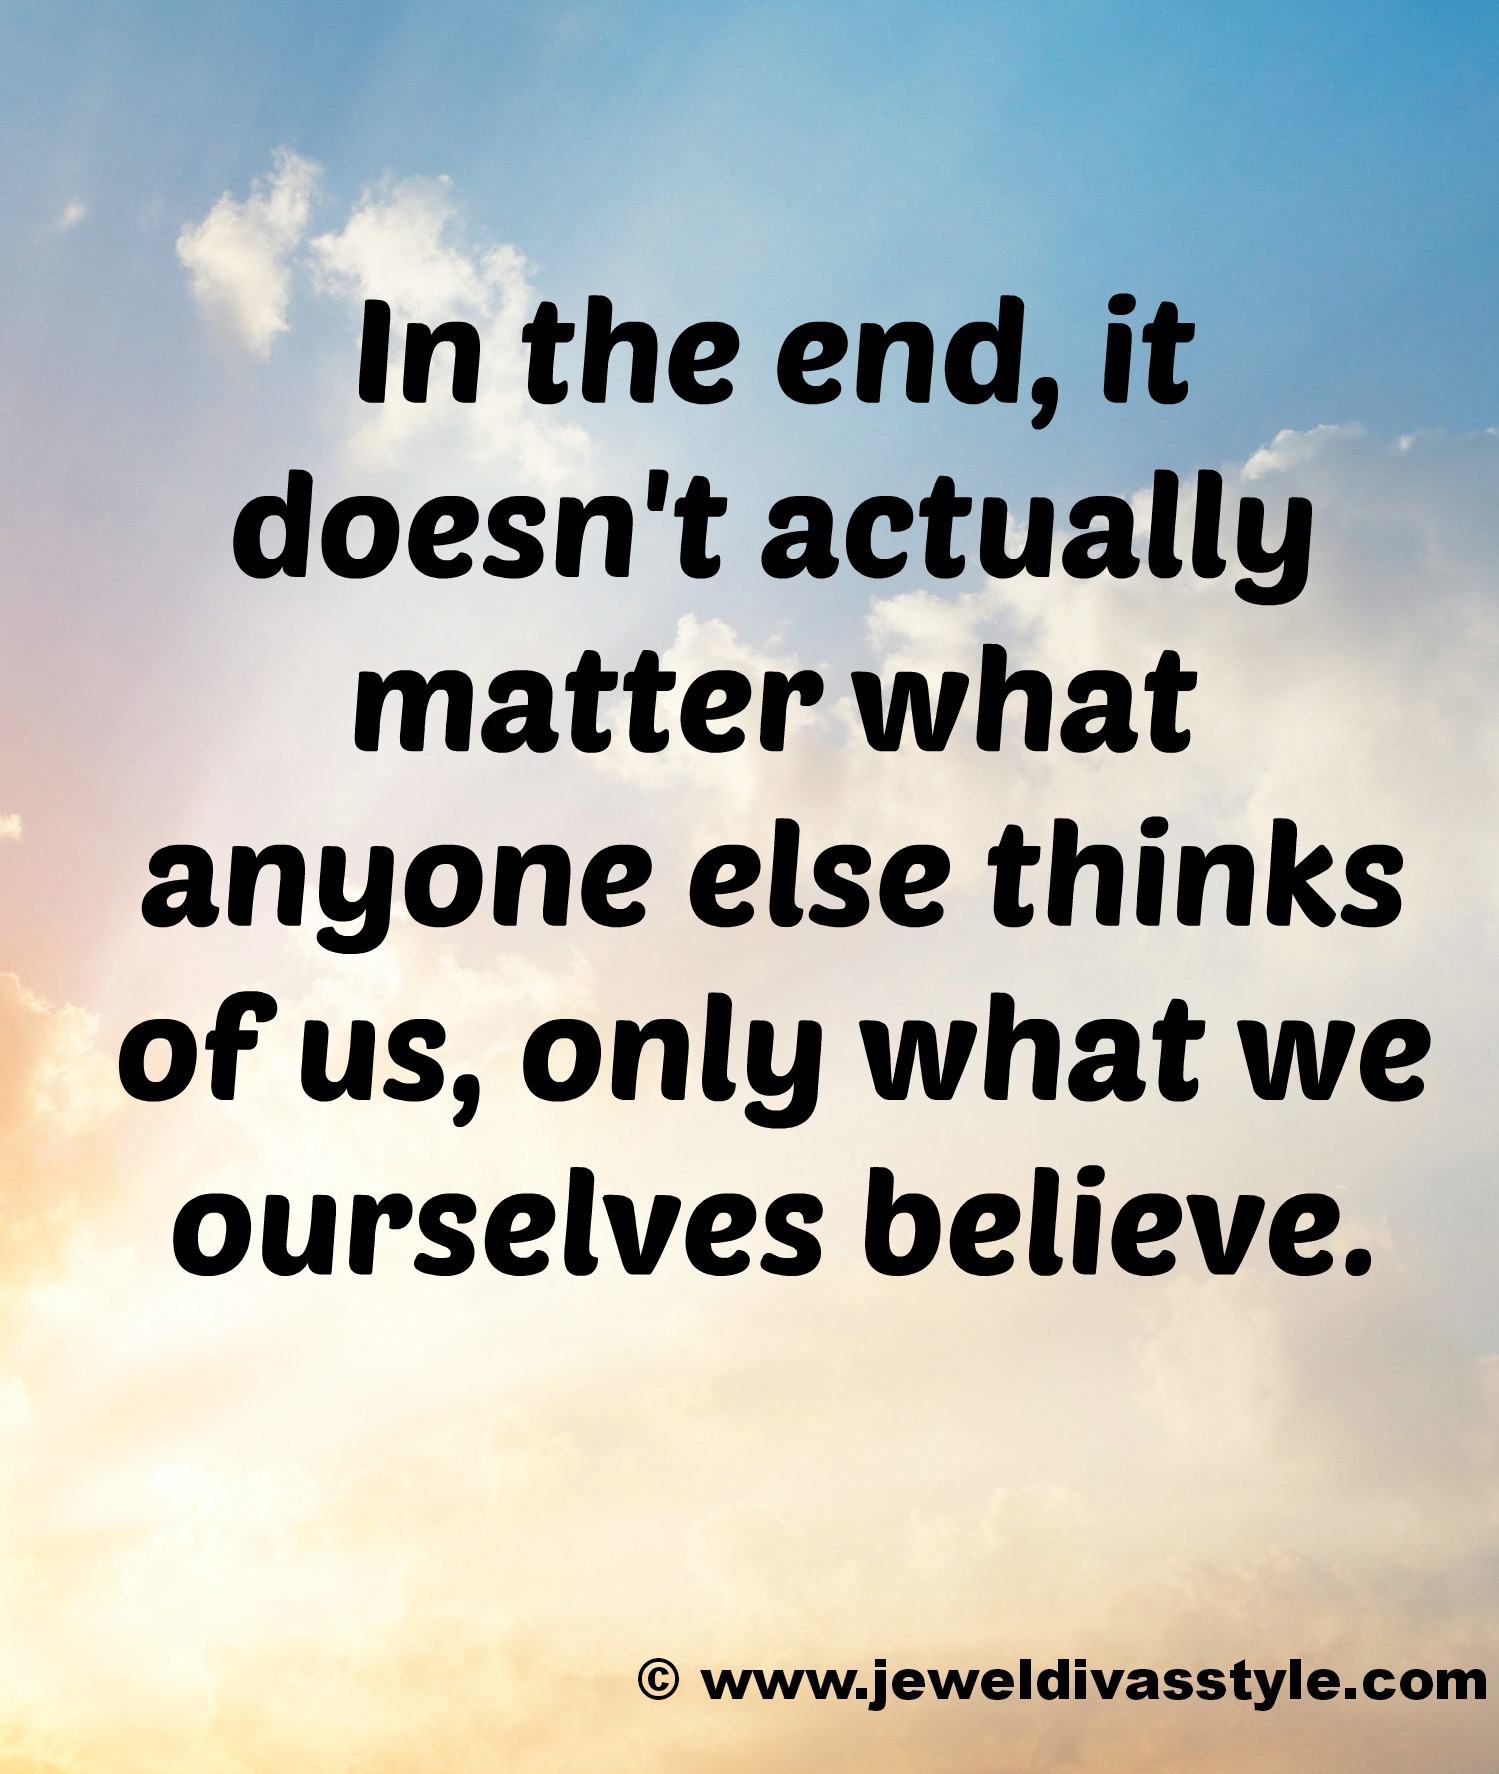 TODAY'S LIFESTYLE: Believe